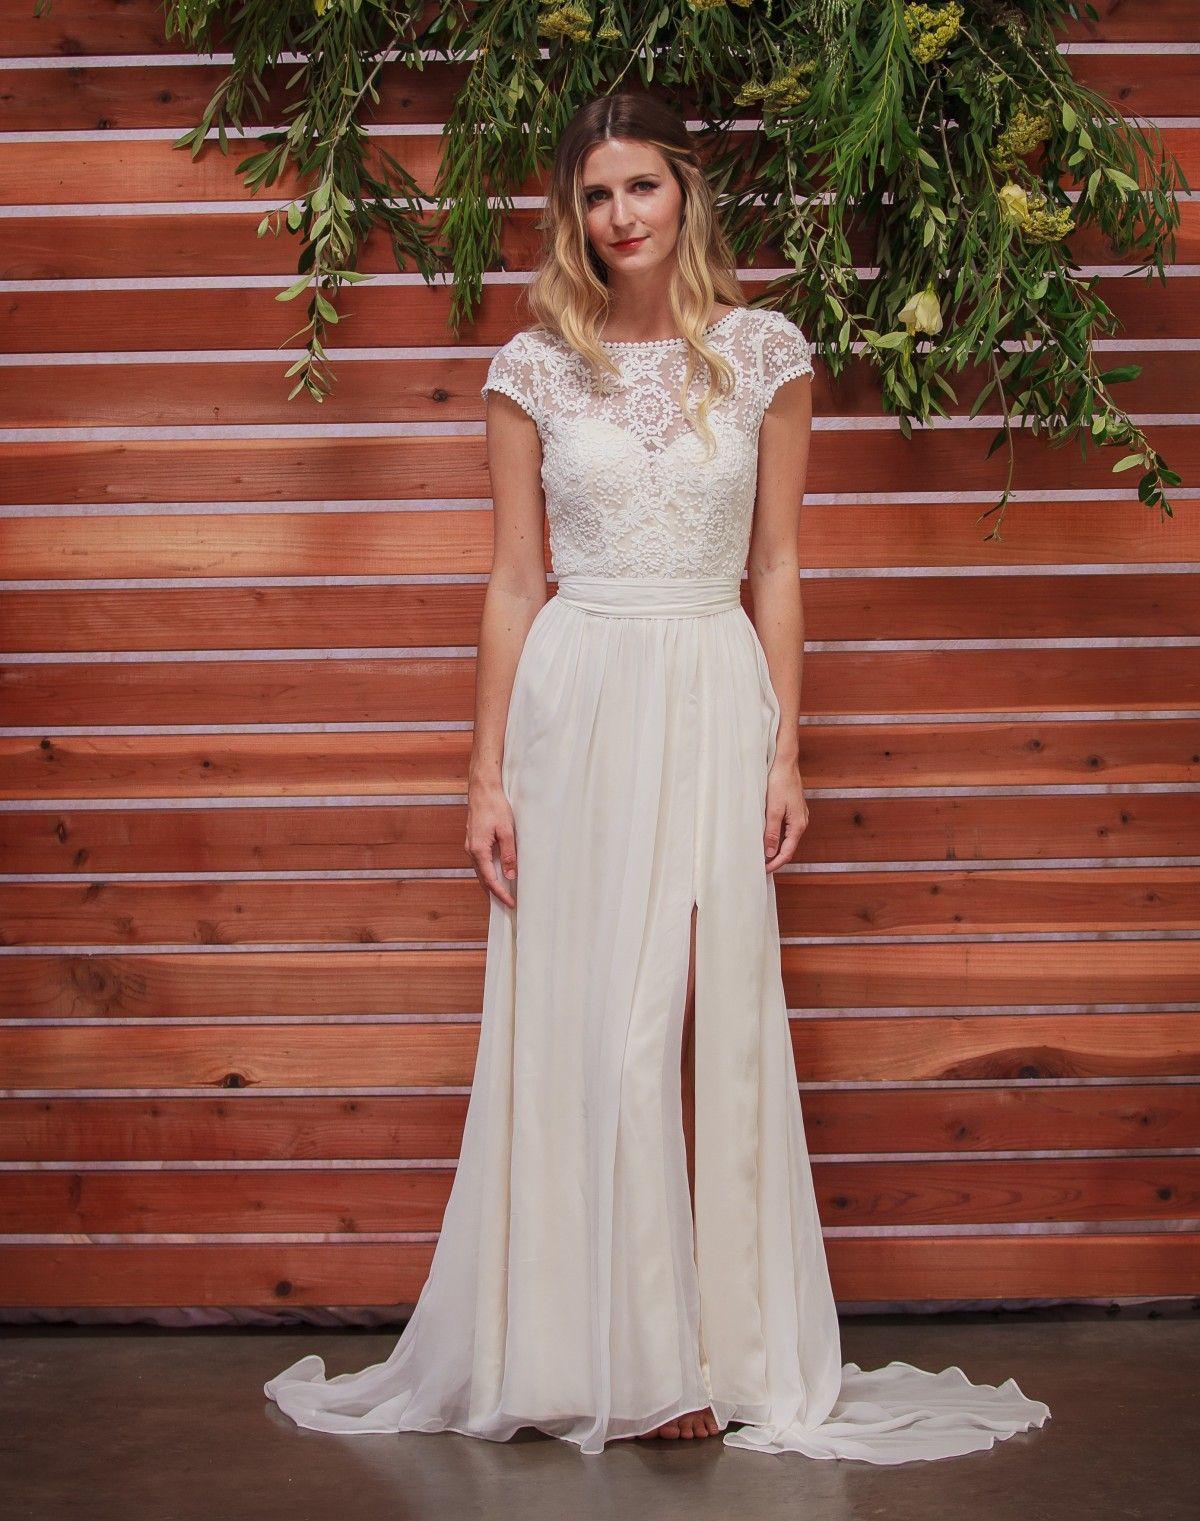 Lace dress wedding  Natalie Silk  Lace Gown  Fall  Wedding  Pinterest  Wedding